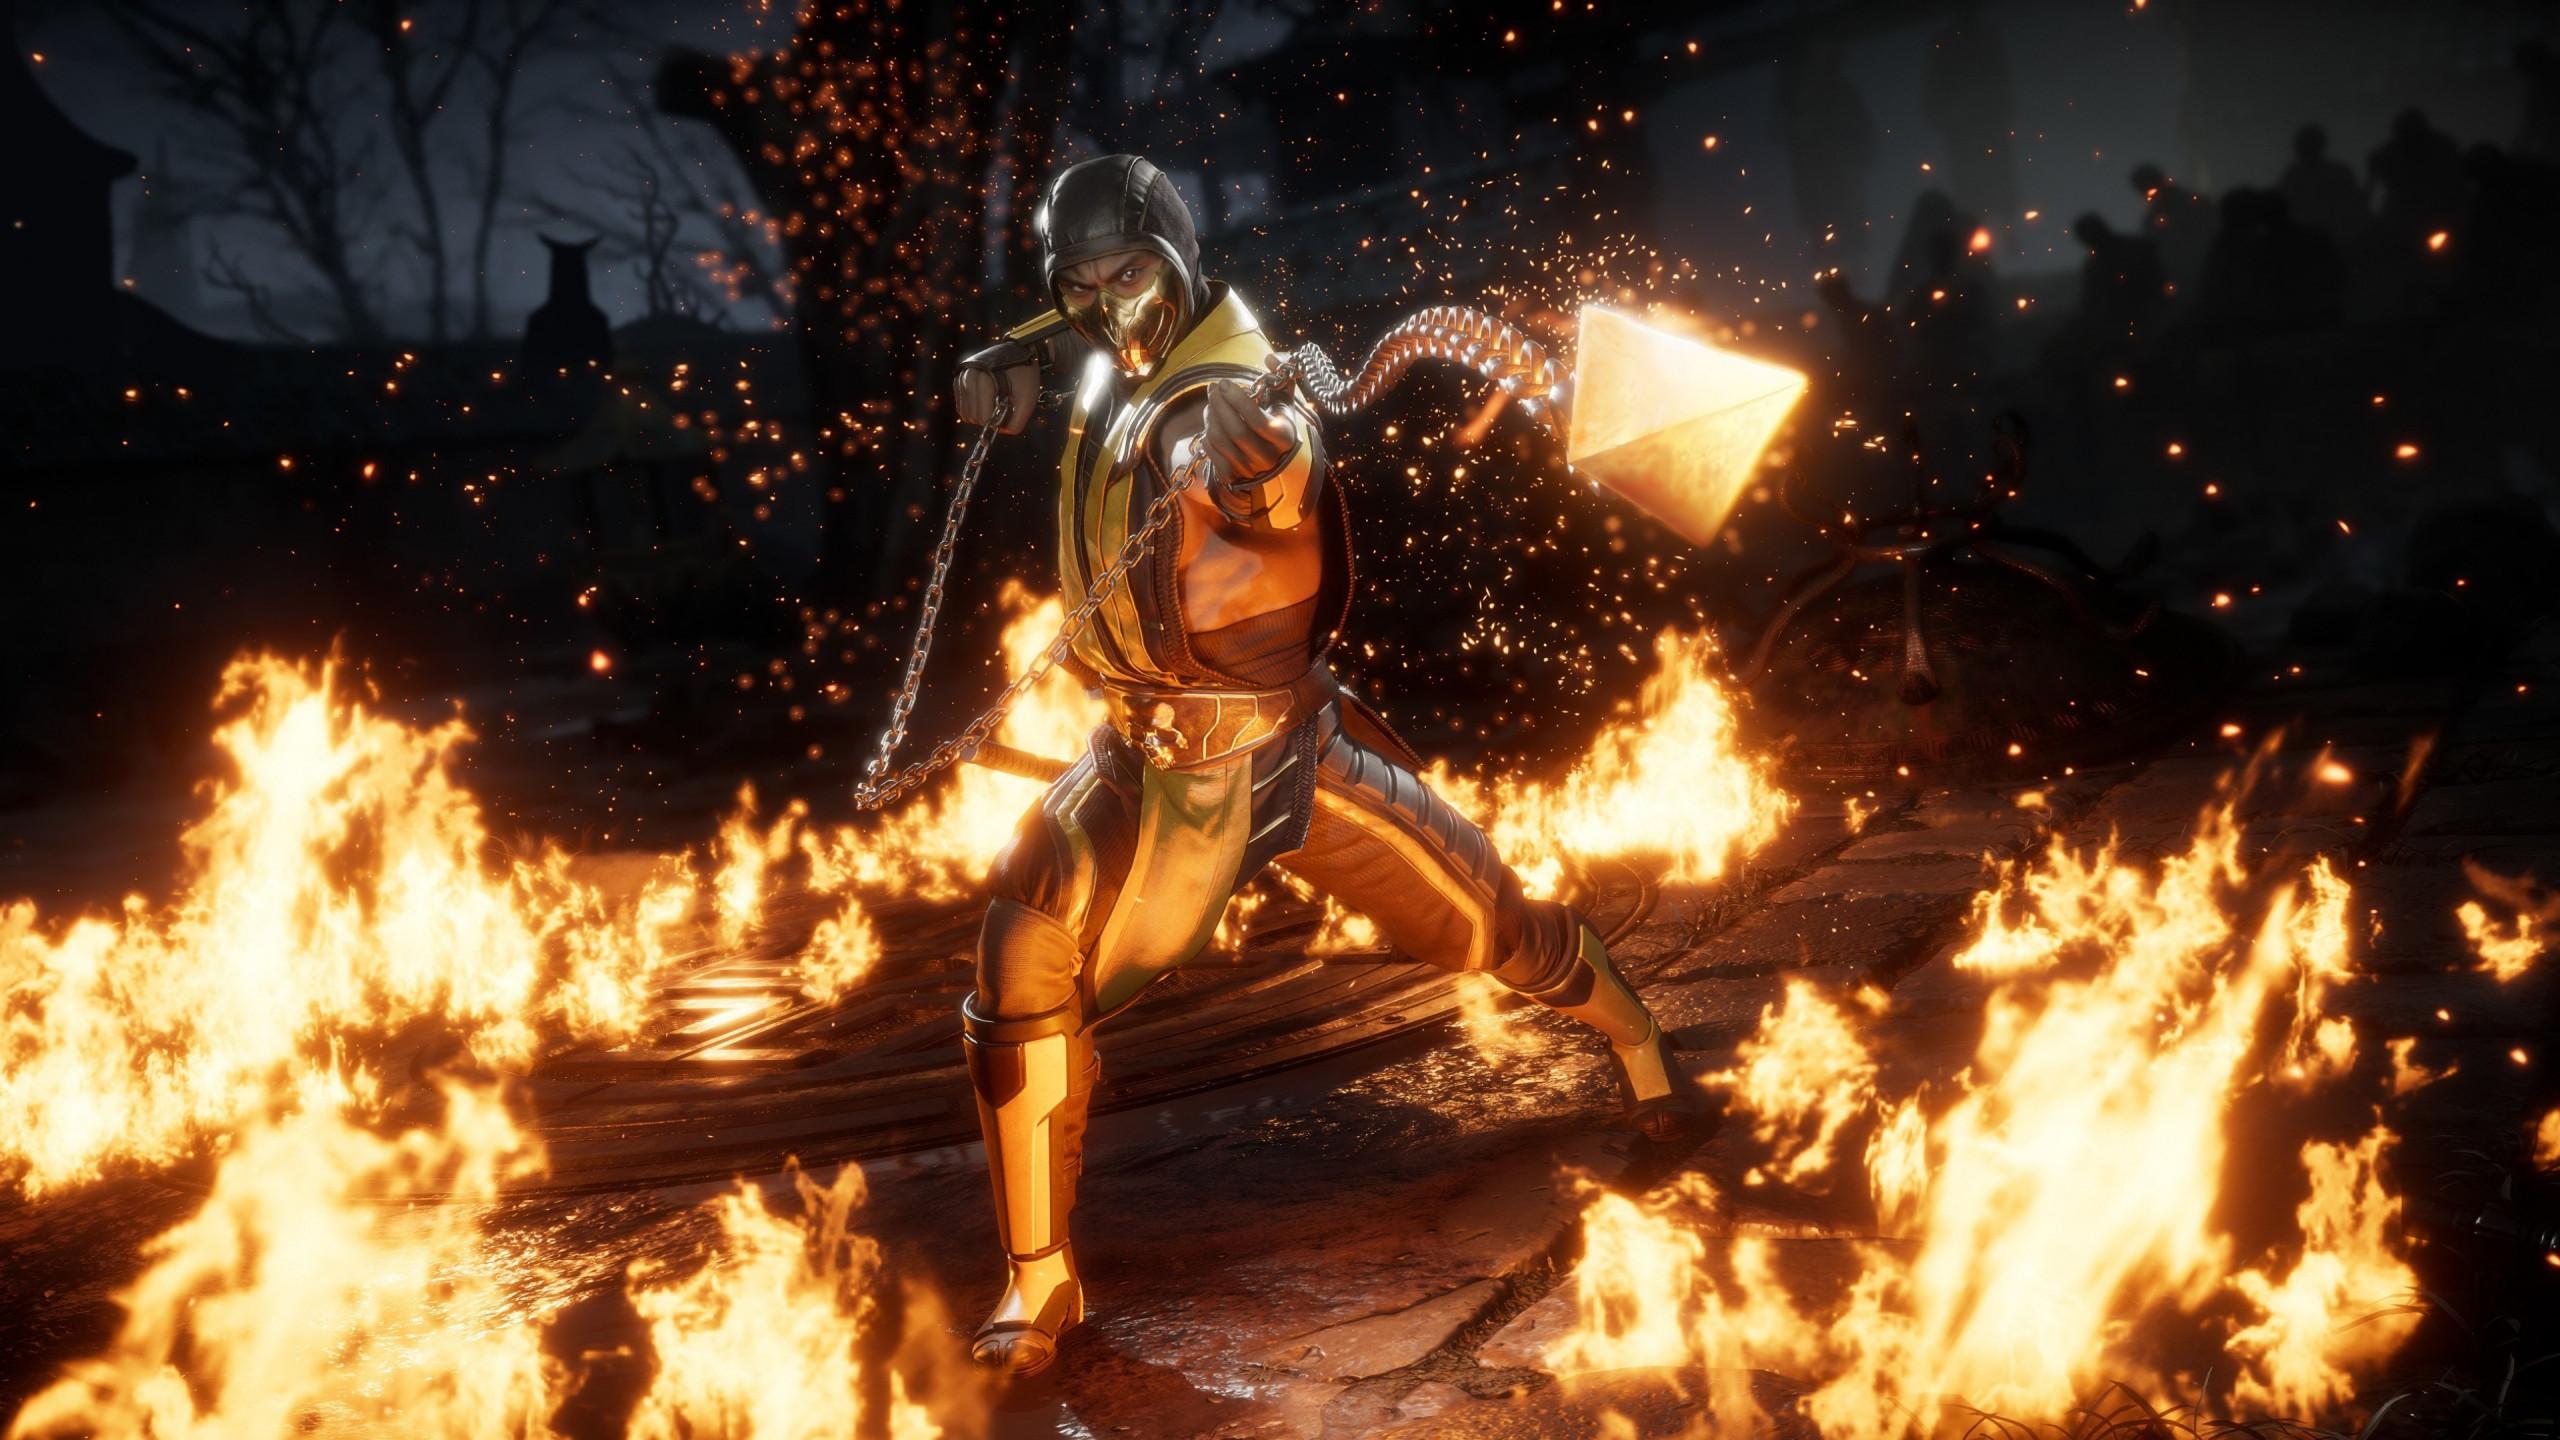 Download Wallpaper Mortal Kombat 11 Scorpion 2560x1440